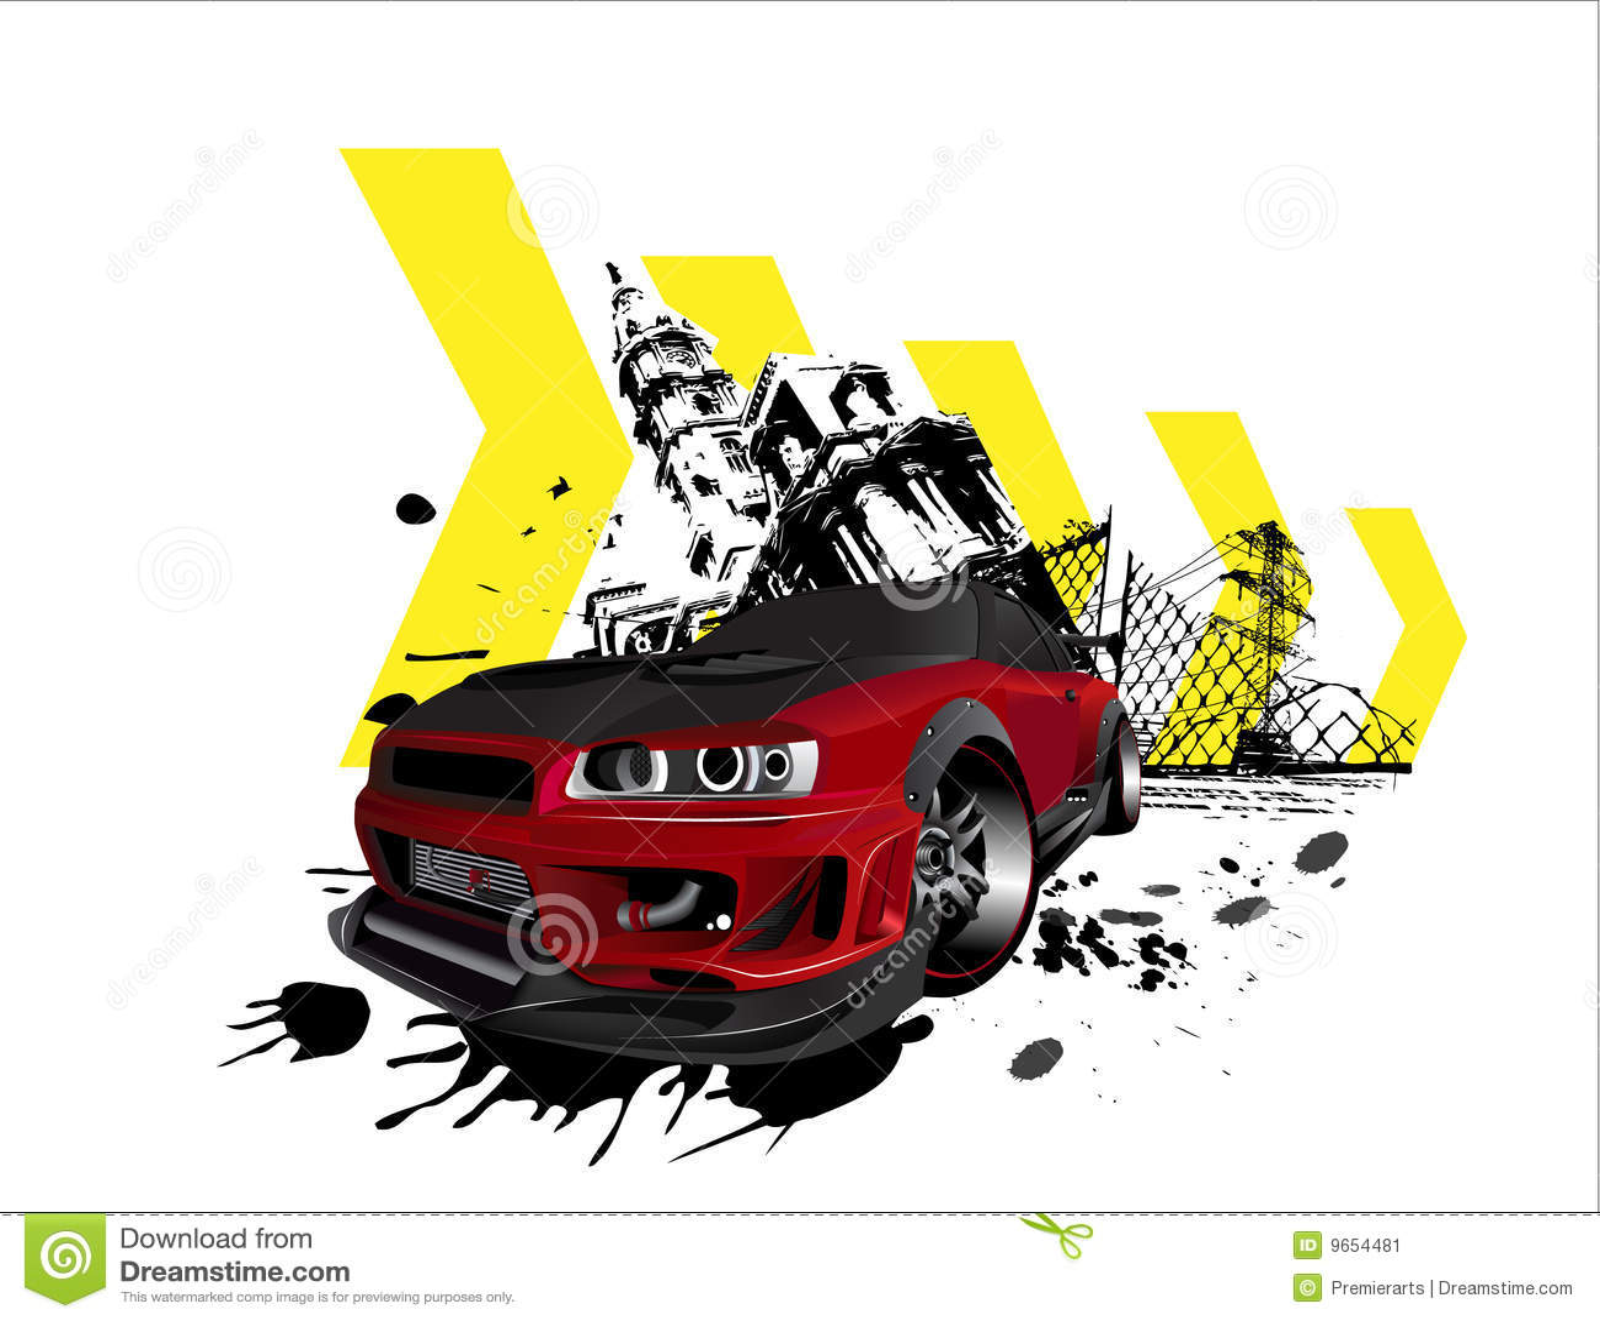 Customized Nissan Skyline Gtr Grunge City Stock Image